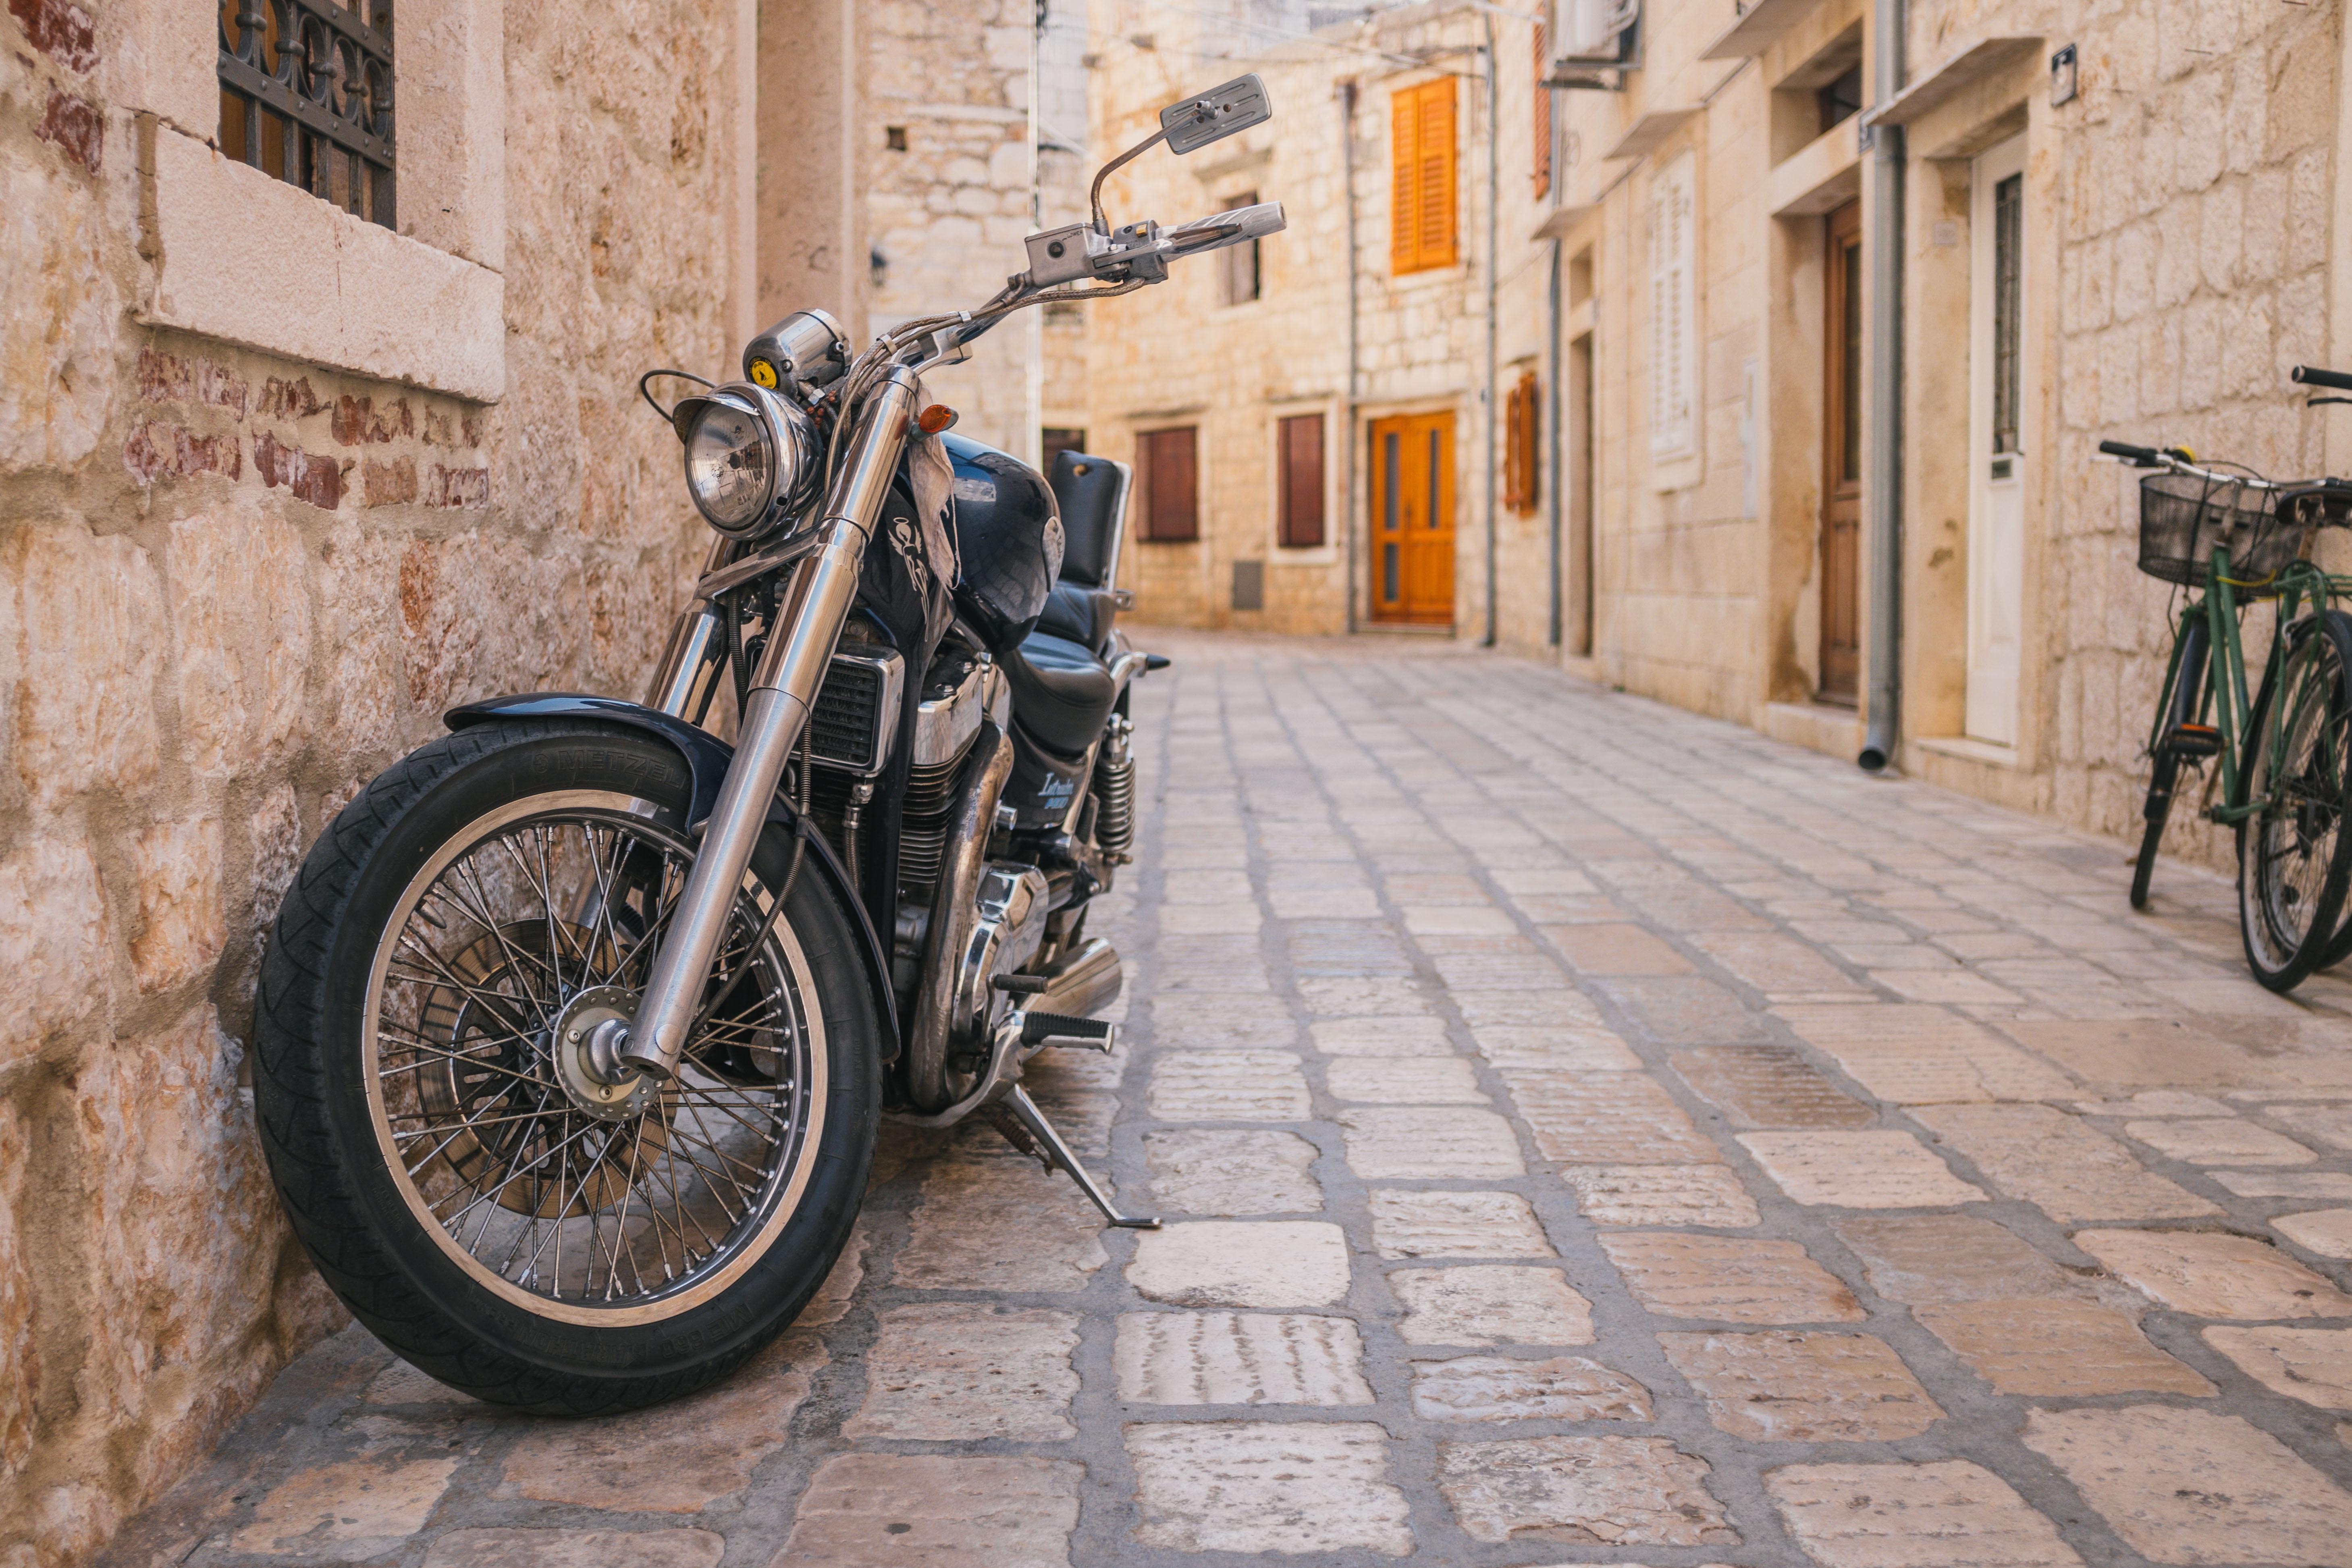 tilt-shift lens photography of motorcycle